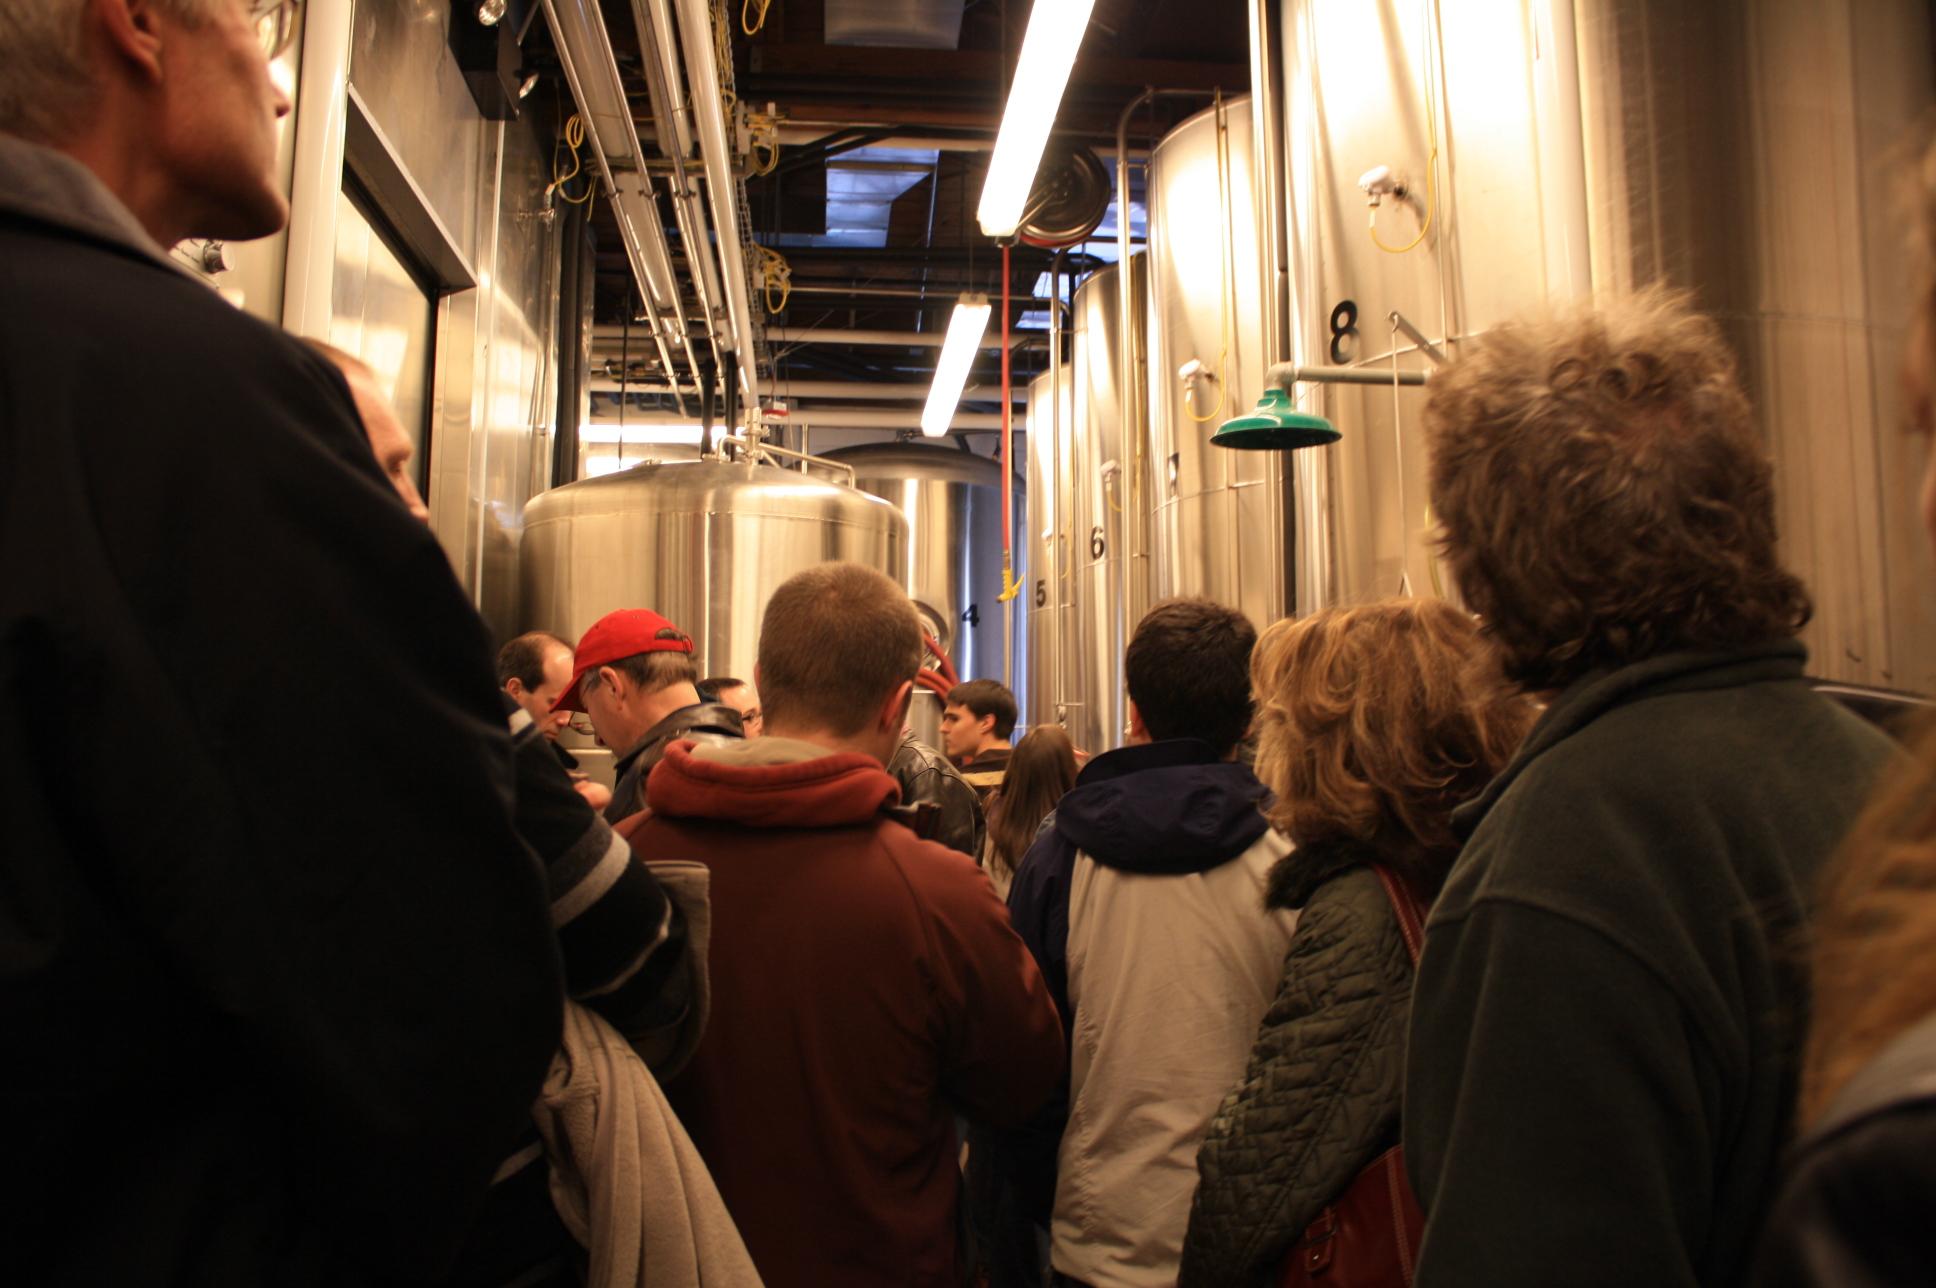 Zwicklemania crowd at Portland's Deschutes Brewery